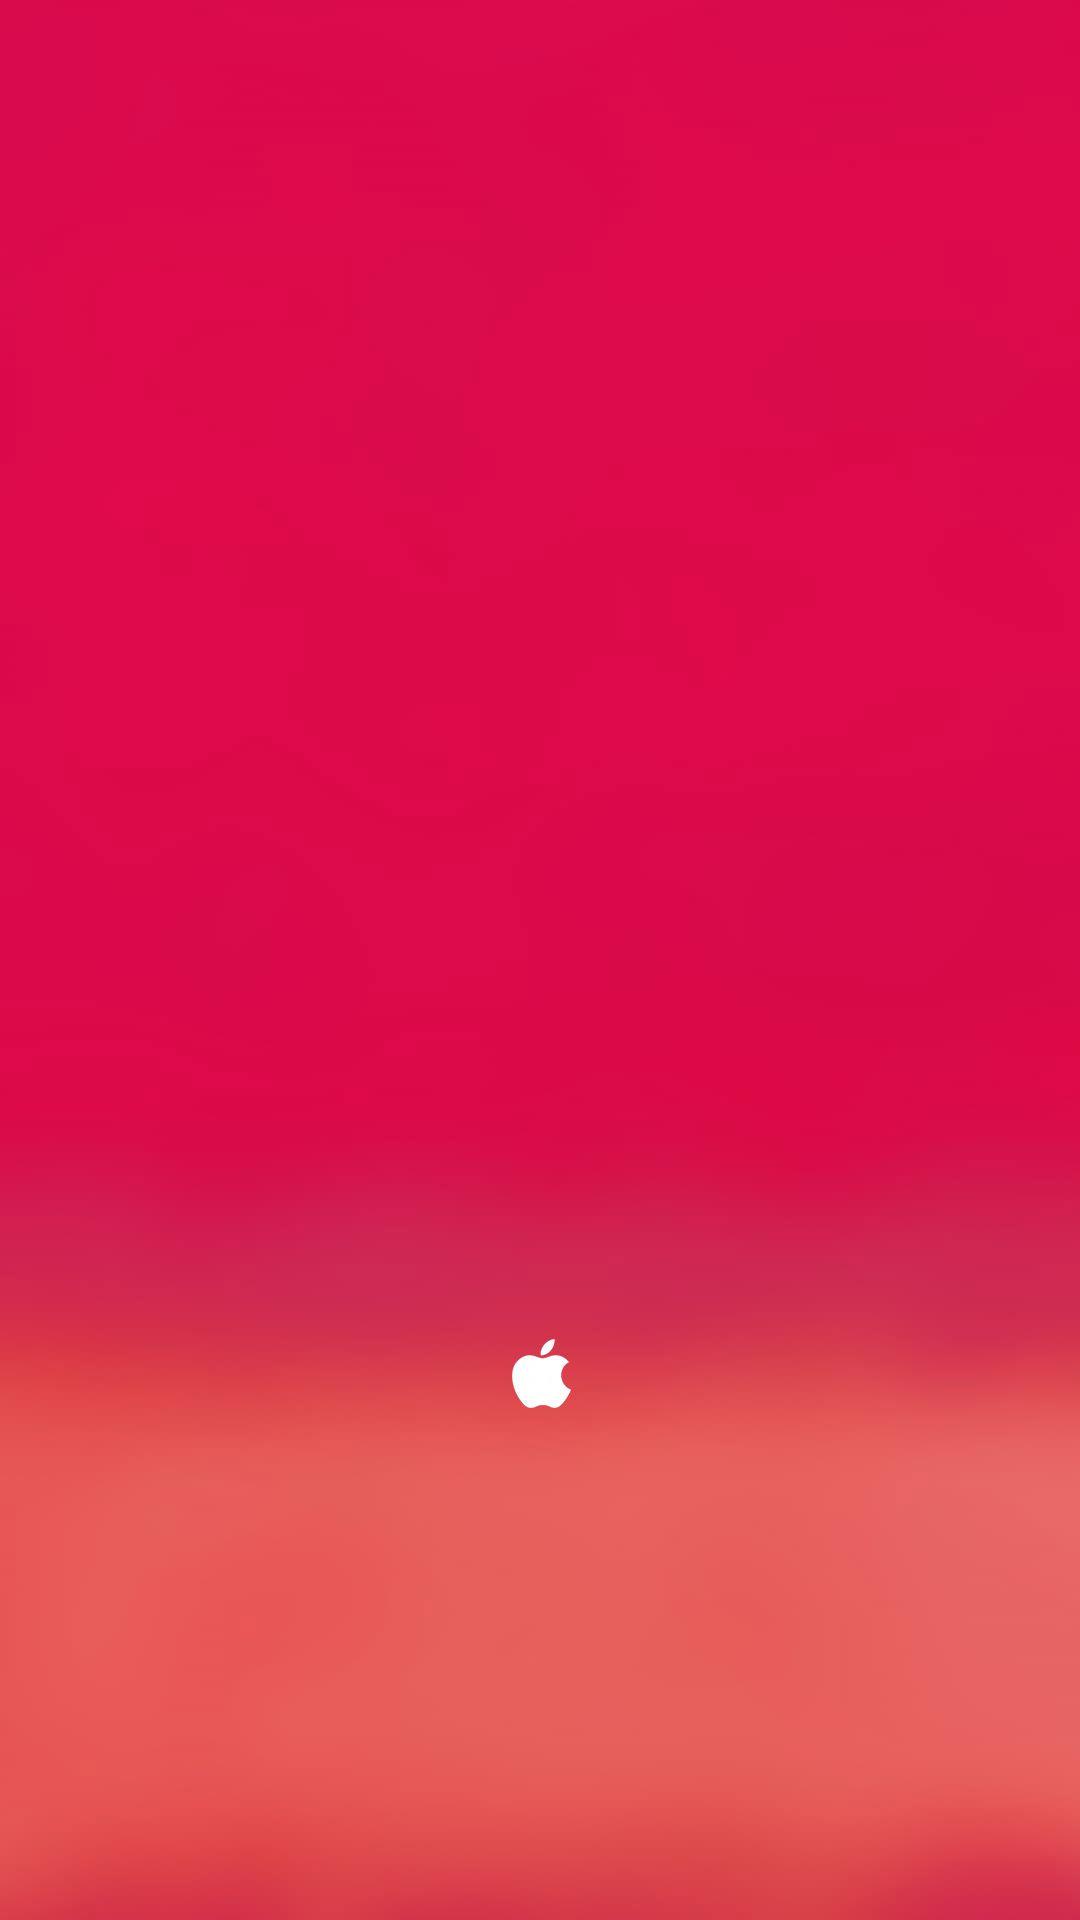 Apple wallpaper, Apple iphone wallpaper ...